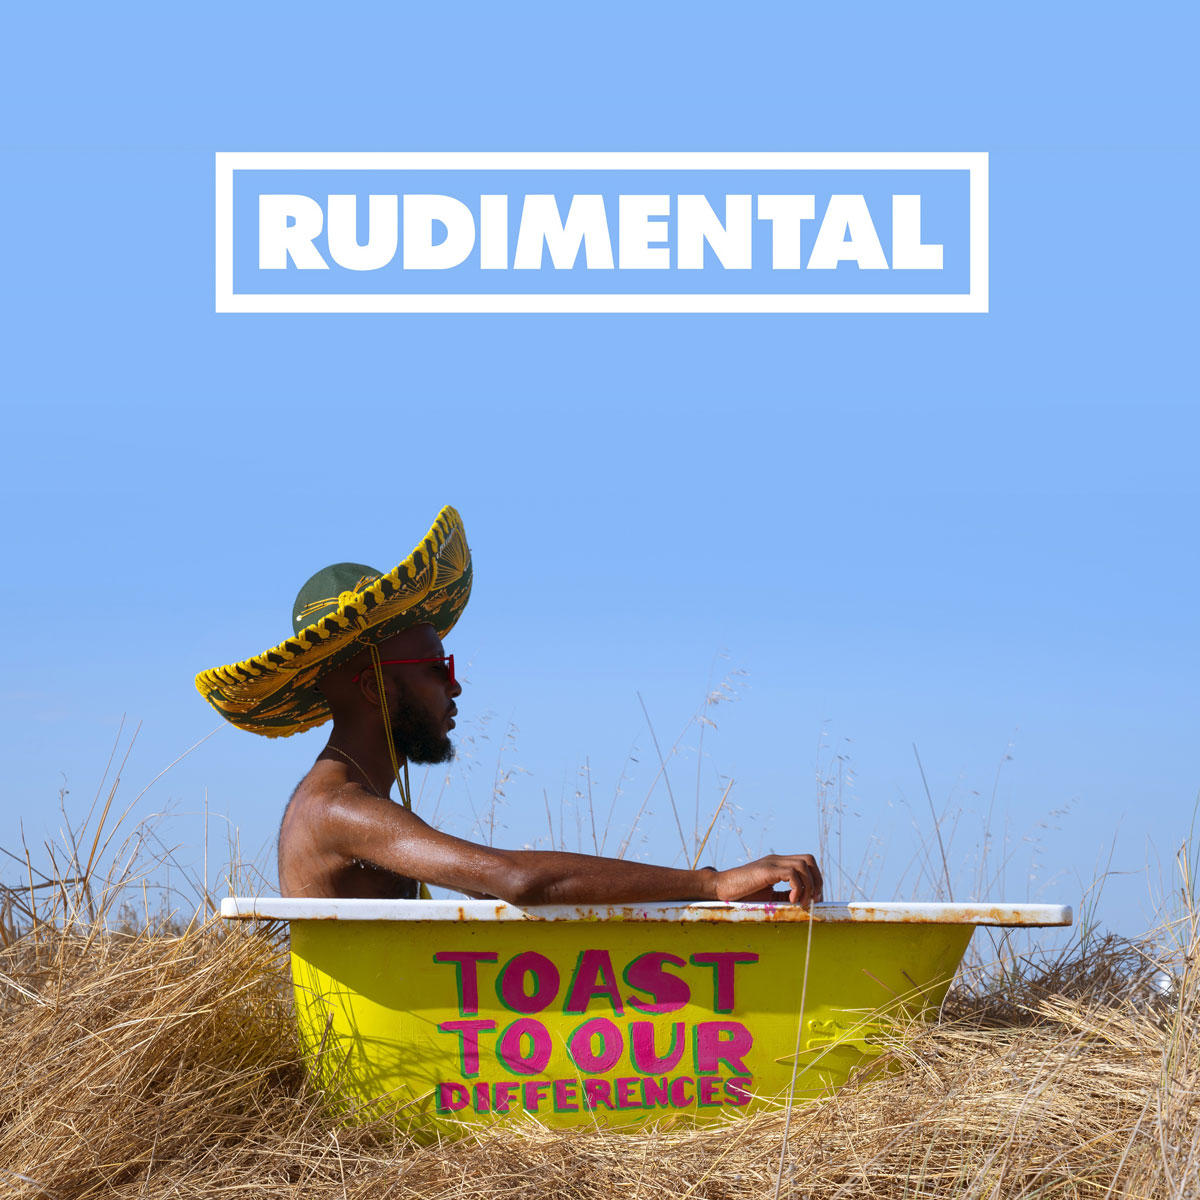 Rudimental Rudimental. Toast To Our Differences rudimental birmingham